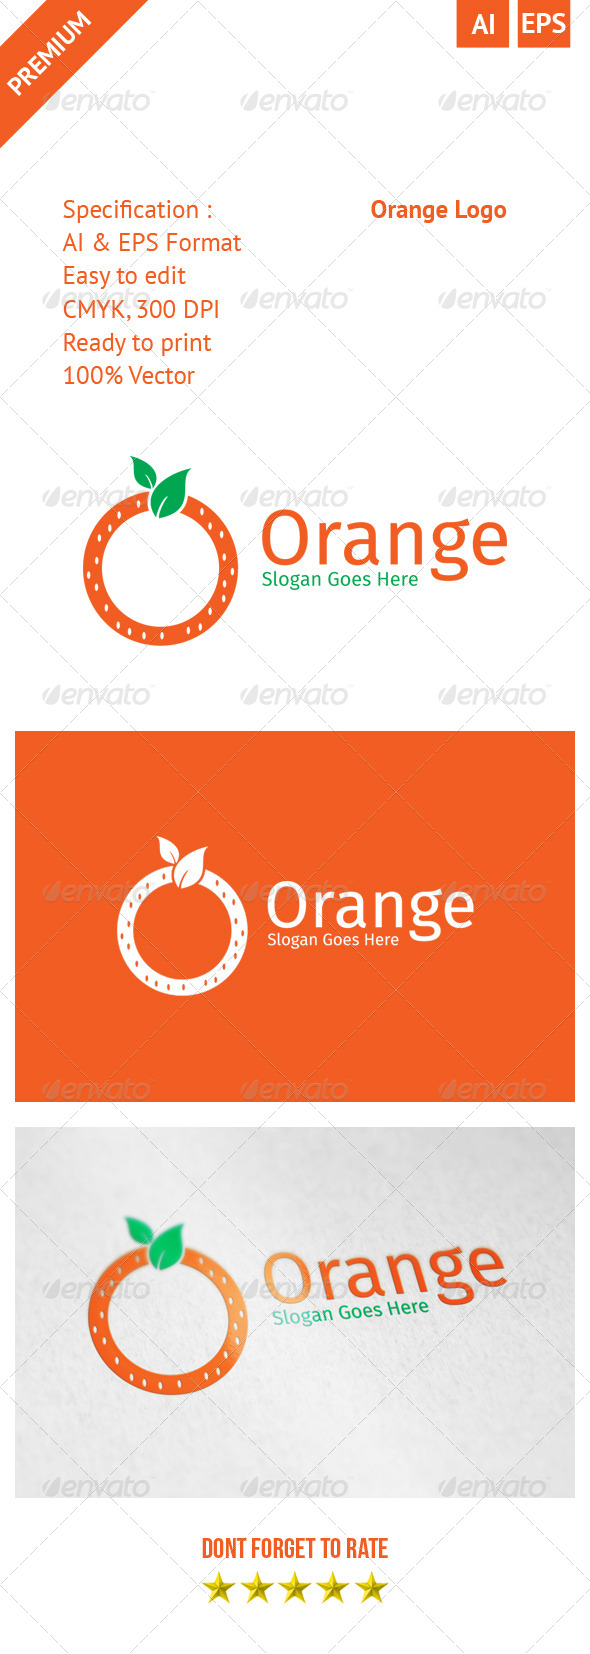 GraphicRiver Orange Logo 8193673